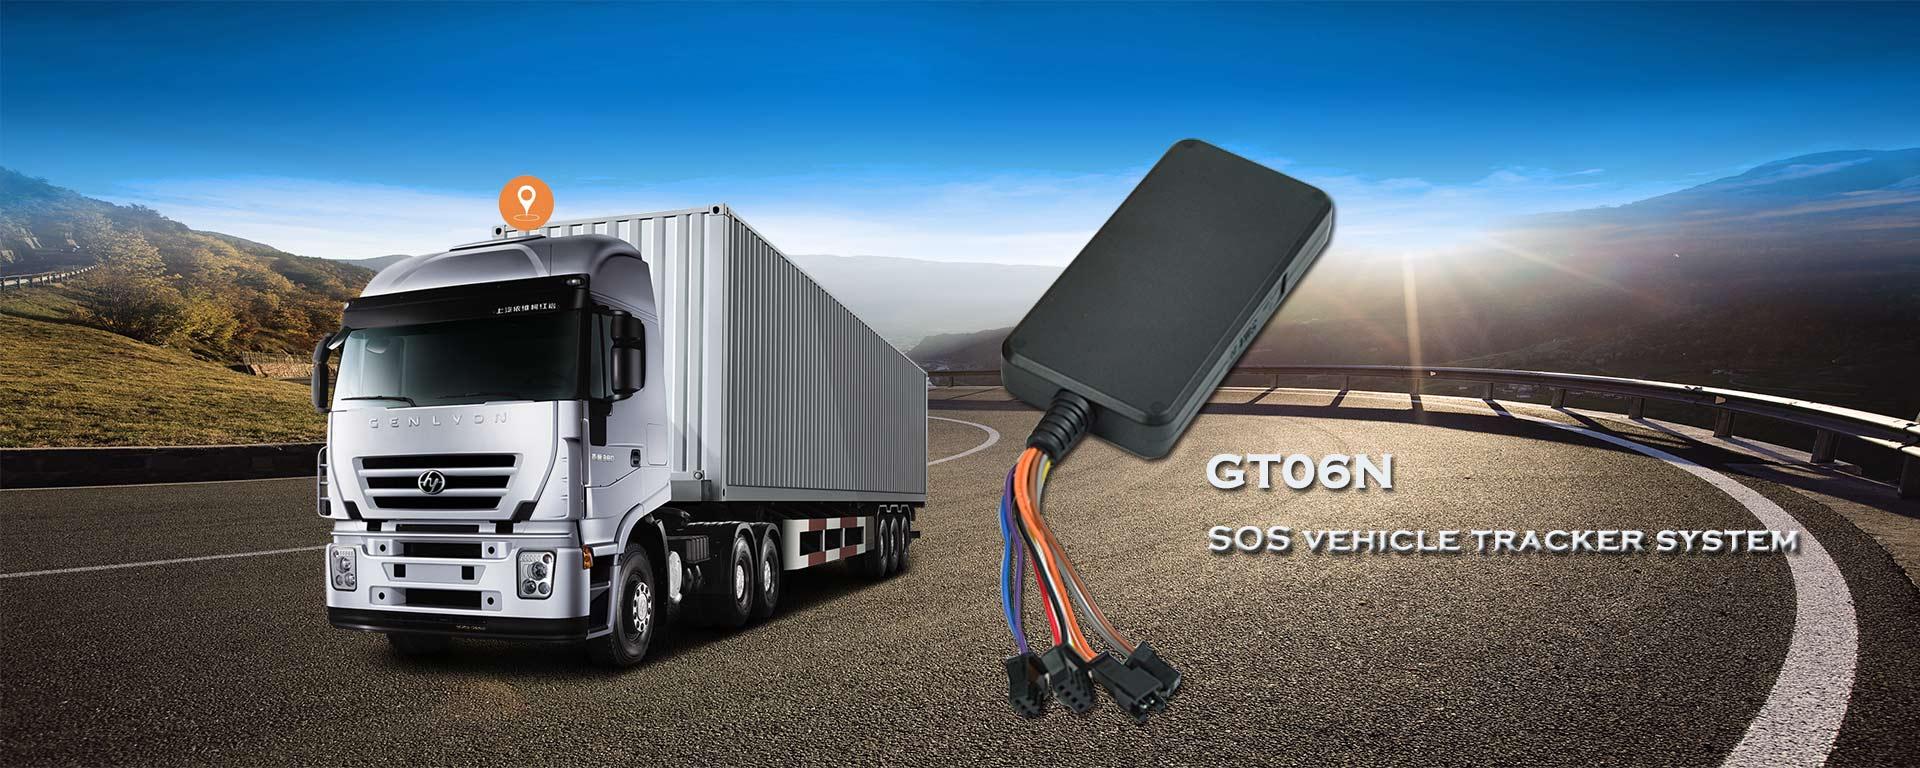 GT06S GPS truck Fleet tracking device